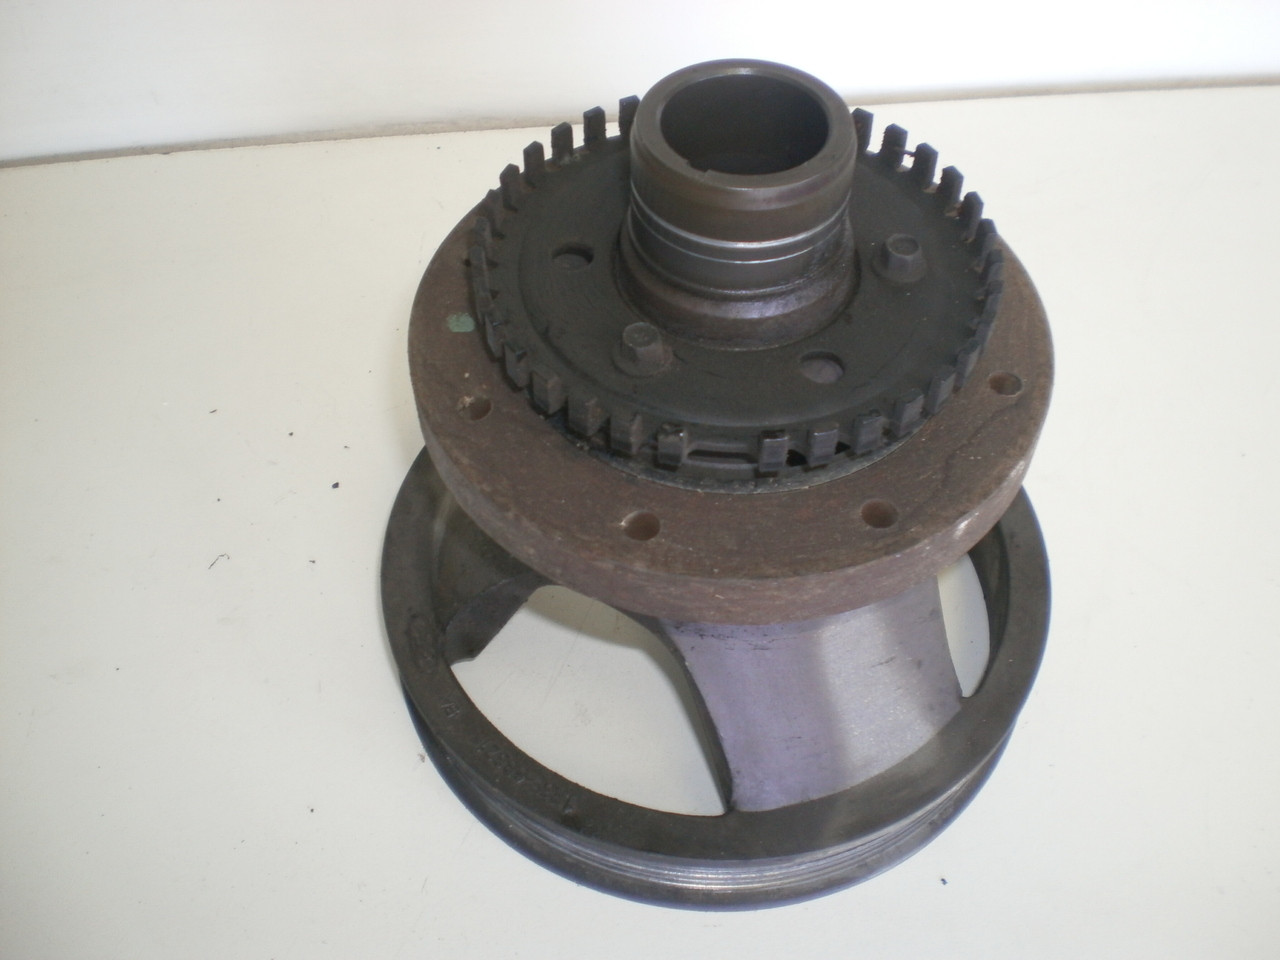 2001 v6 mustang water pump